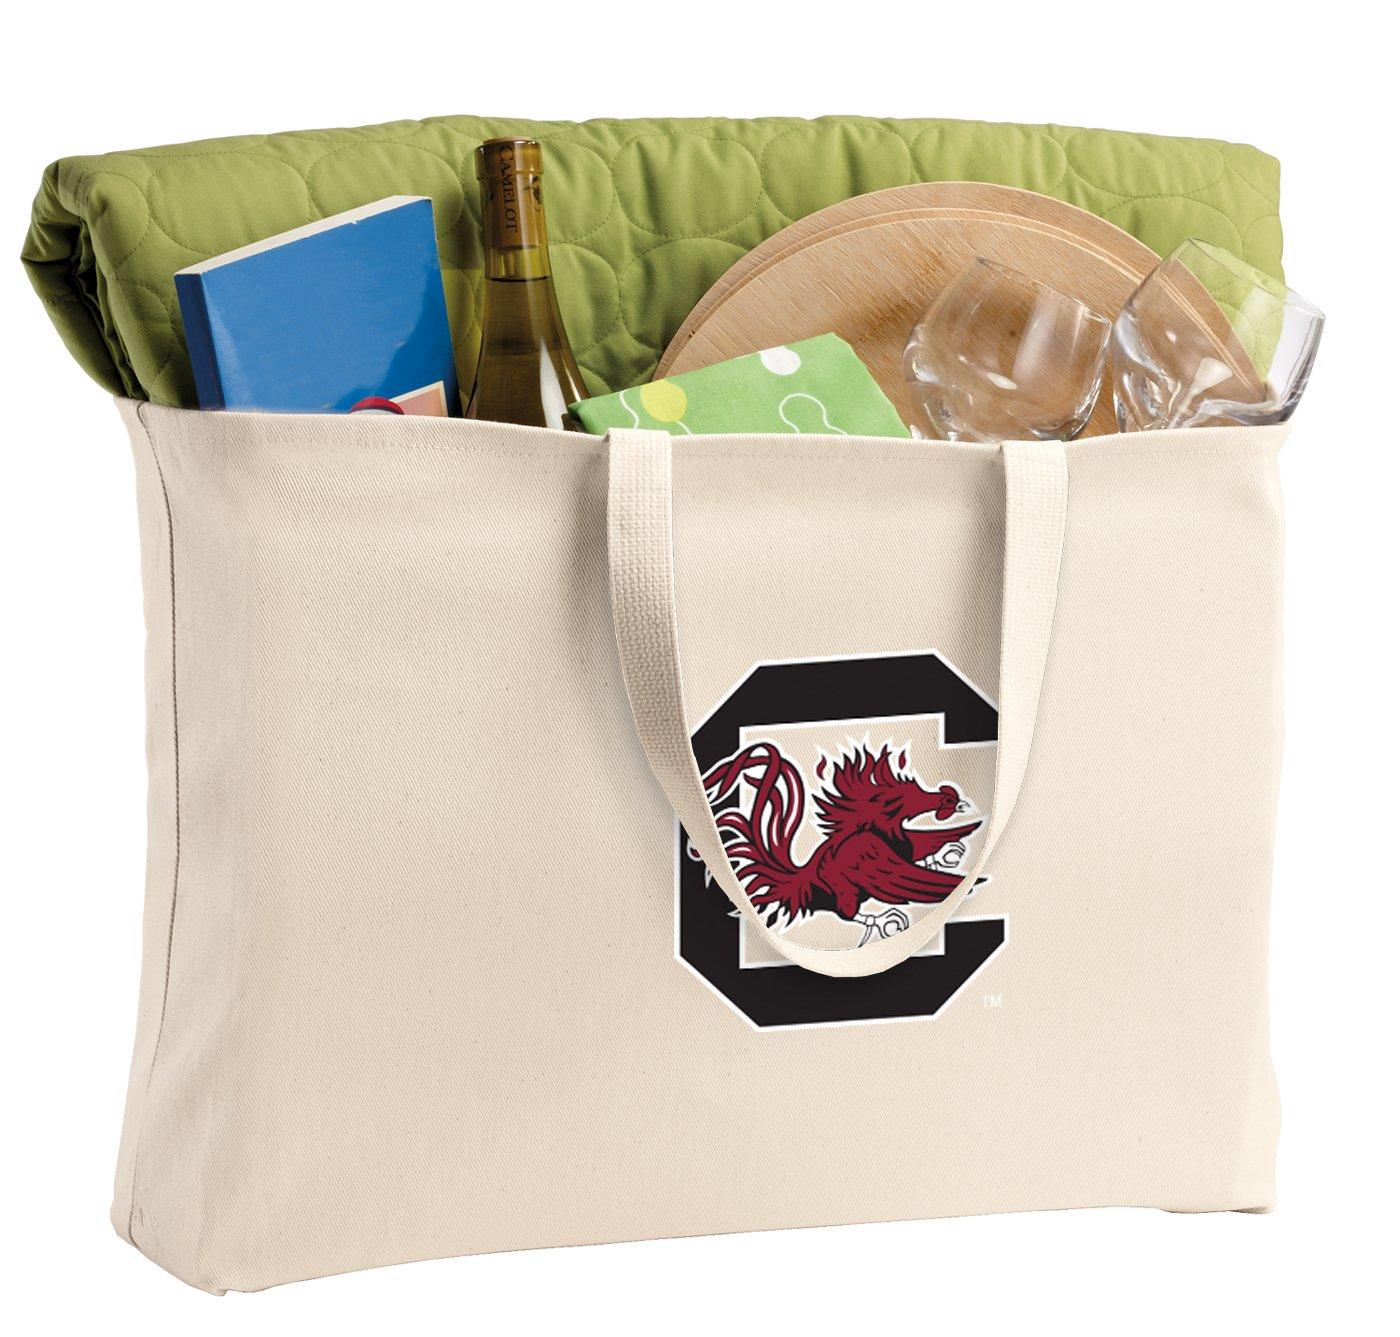 JUMBO University of South Carolina Tote Bag or Large Canvas USC Gamecocks Shopping Bag